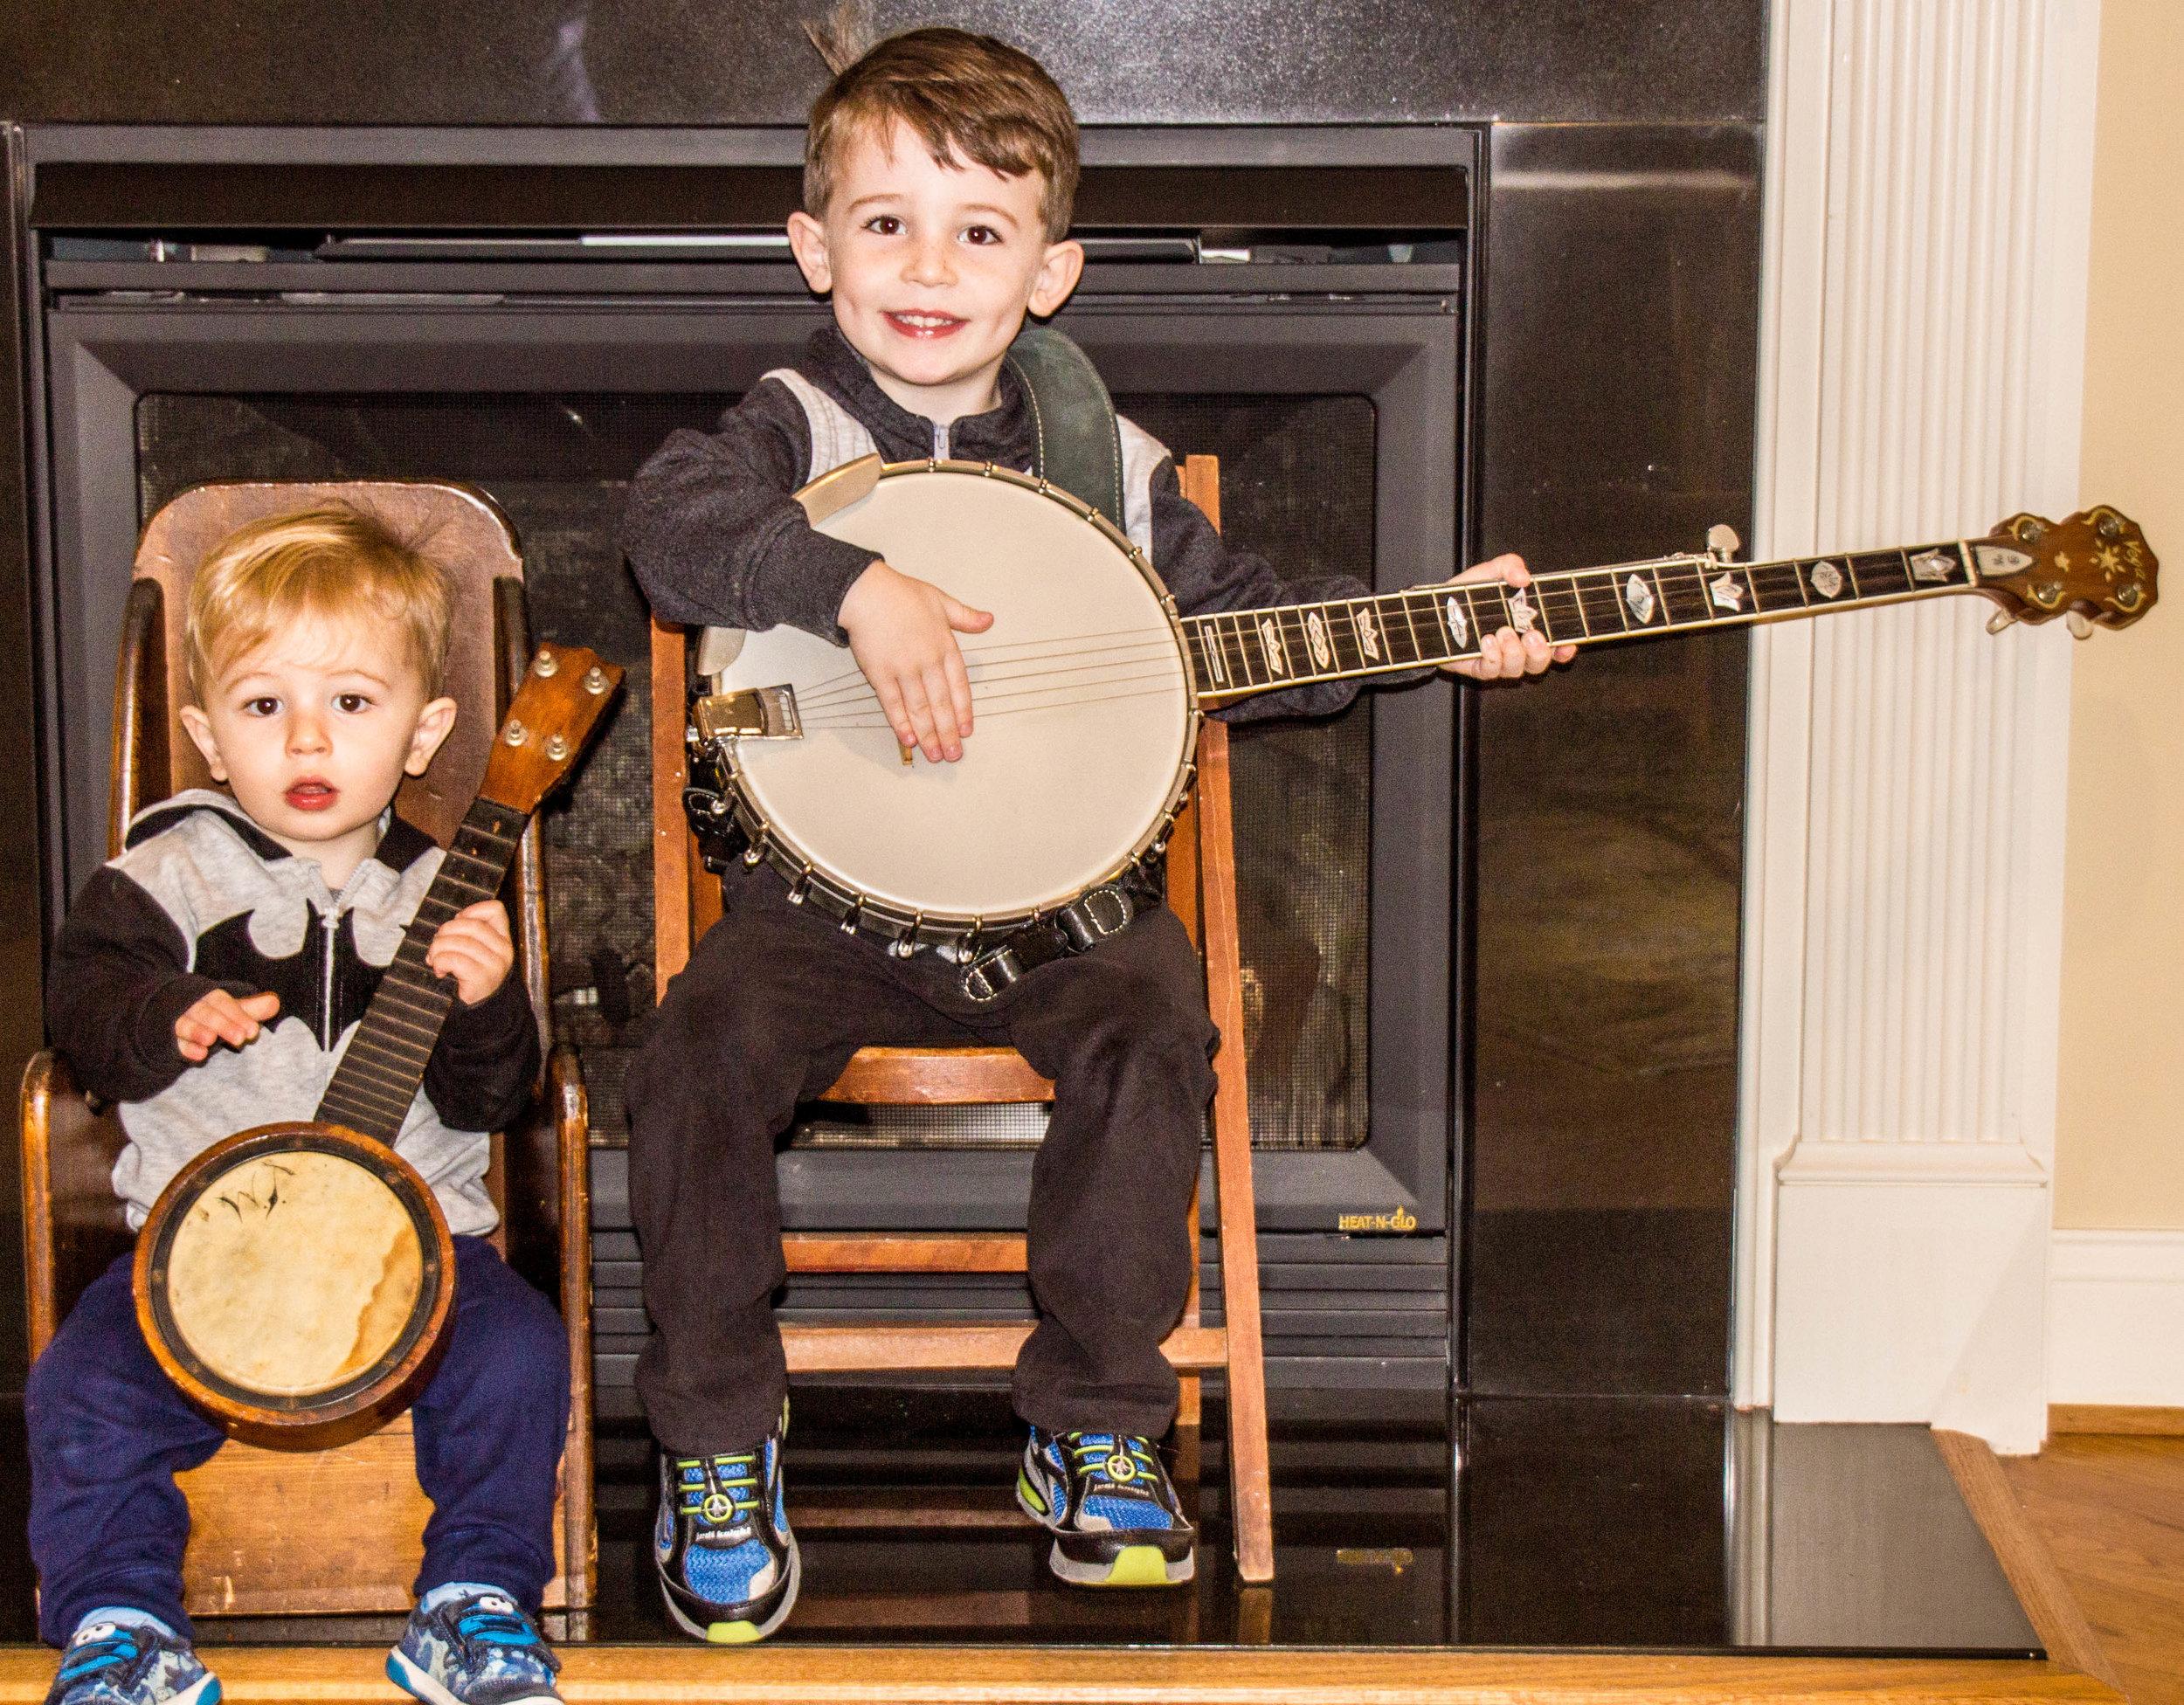 CLAY_Braedan_Dillon_Cosgrave_banjo-73.JPG